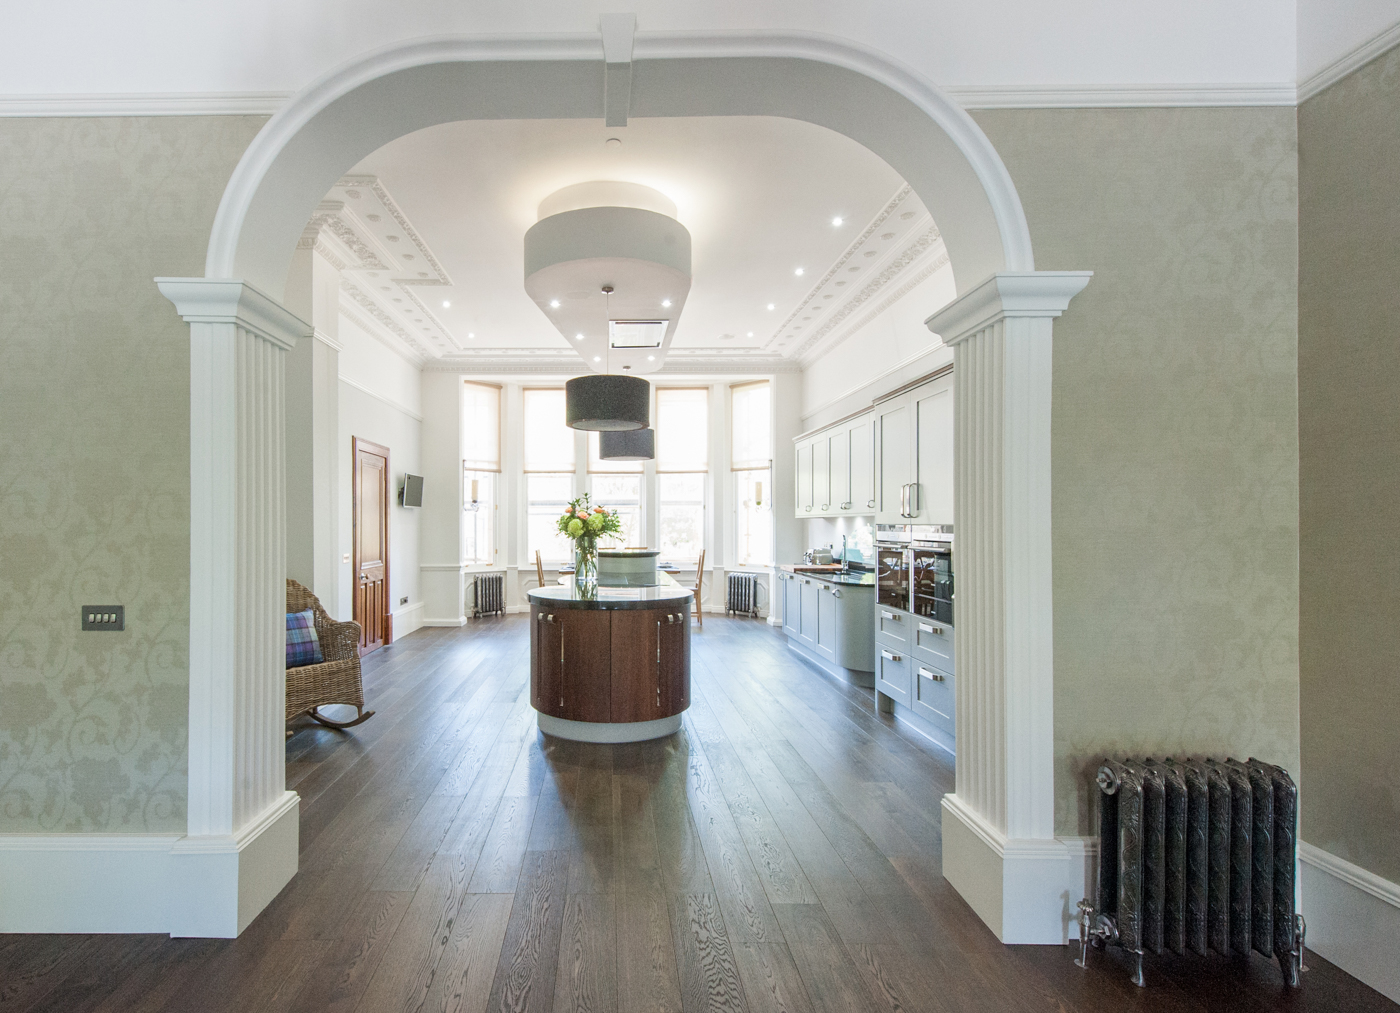 interior photography glasgow, burrell house glasgow, property photograpahy glasgow, kitchen interior, burrell house glasgow